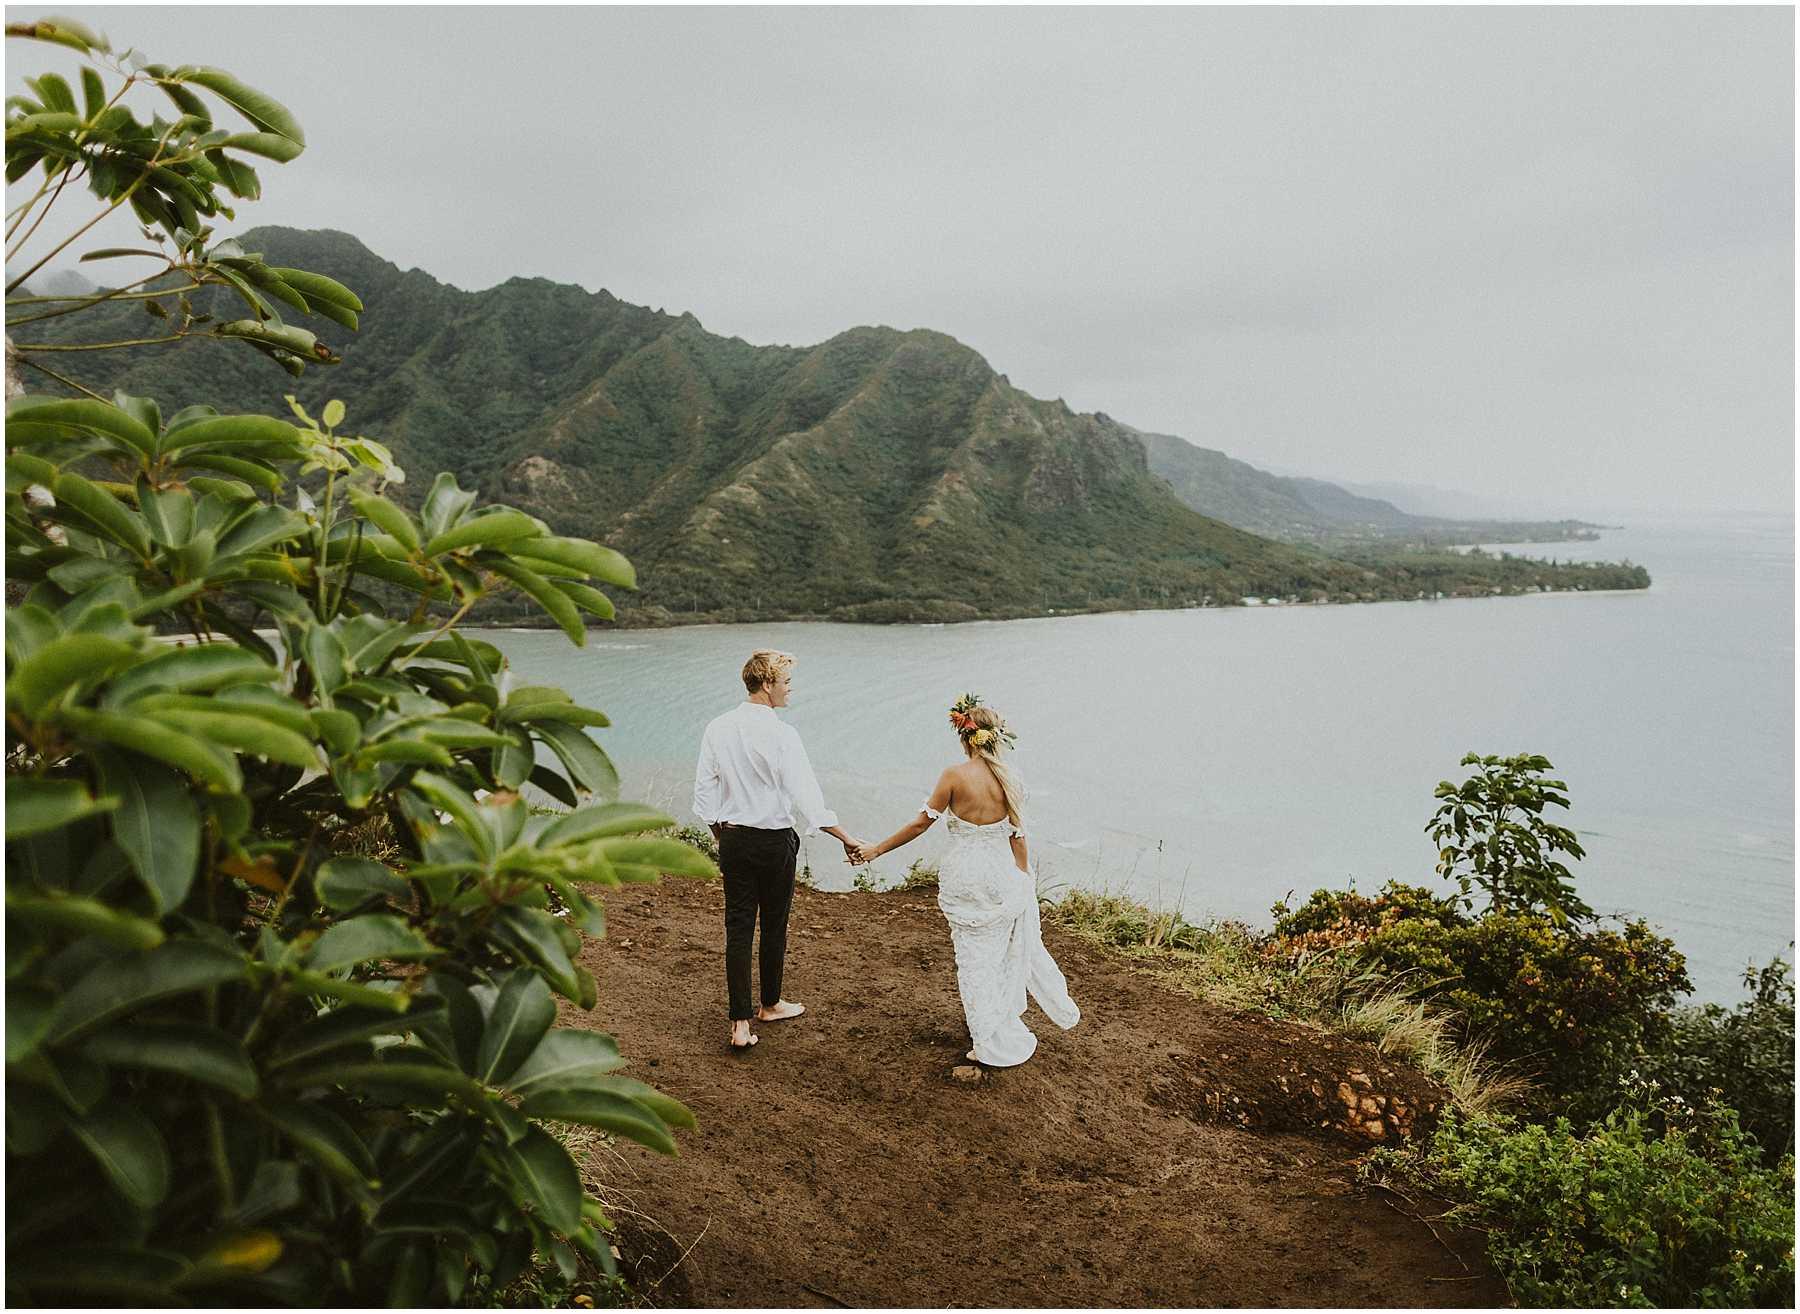 Oahu_Hawaii_Elopement_0005-1.jpg